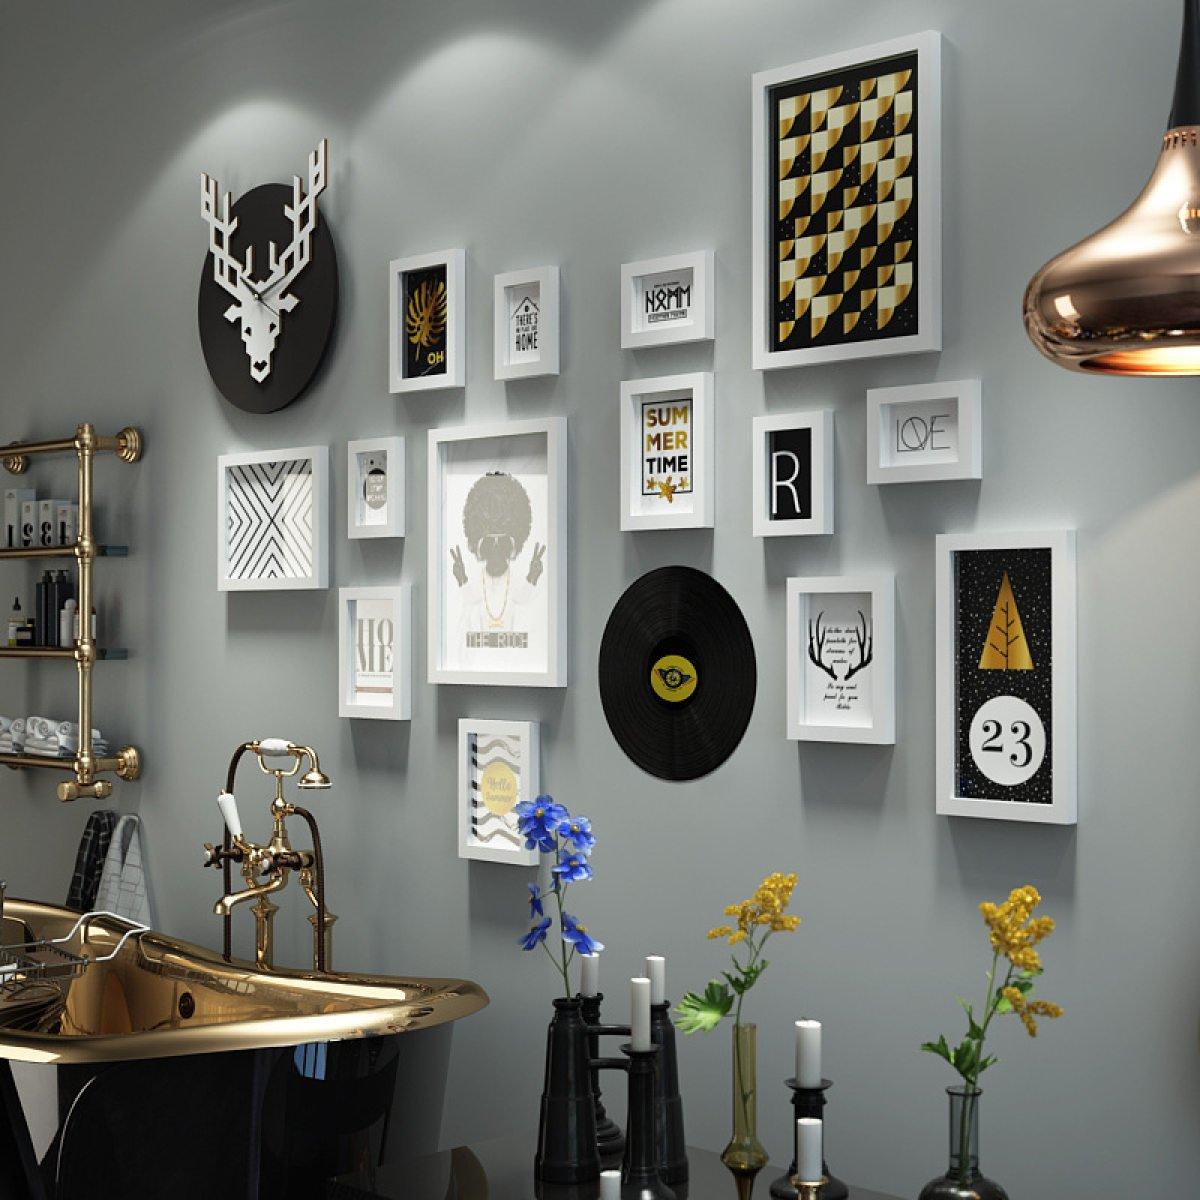 MEI Fotowand Foto Wandbehang Combo Bilderrahmen Wand Home Dekorative ...